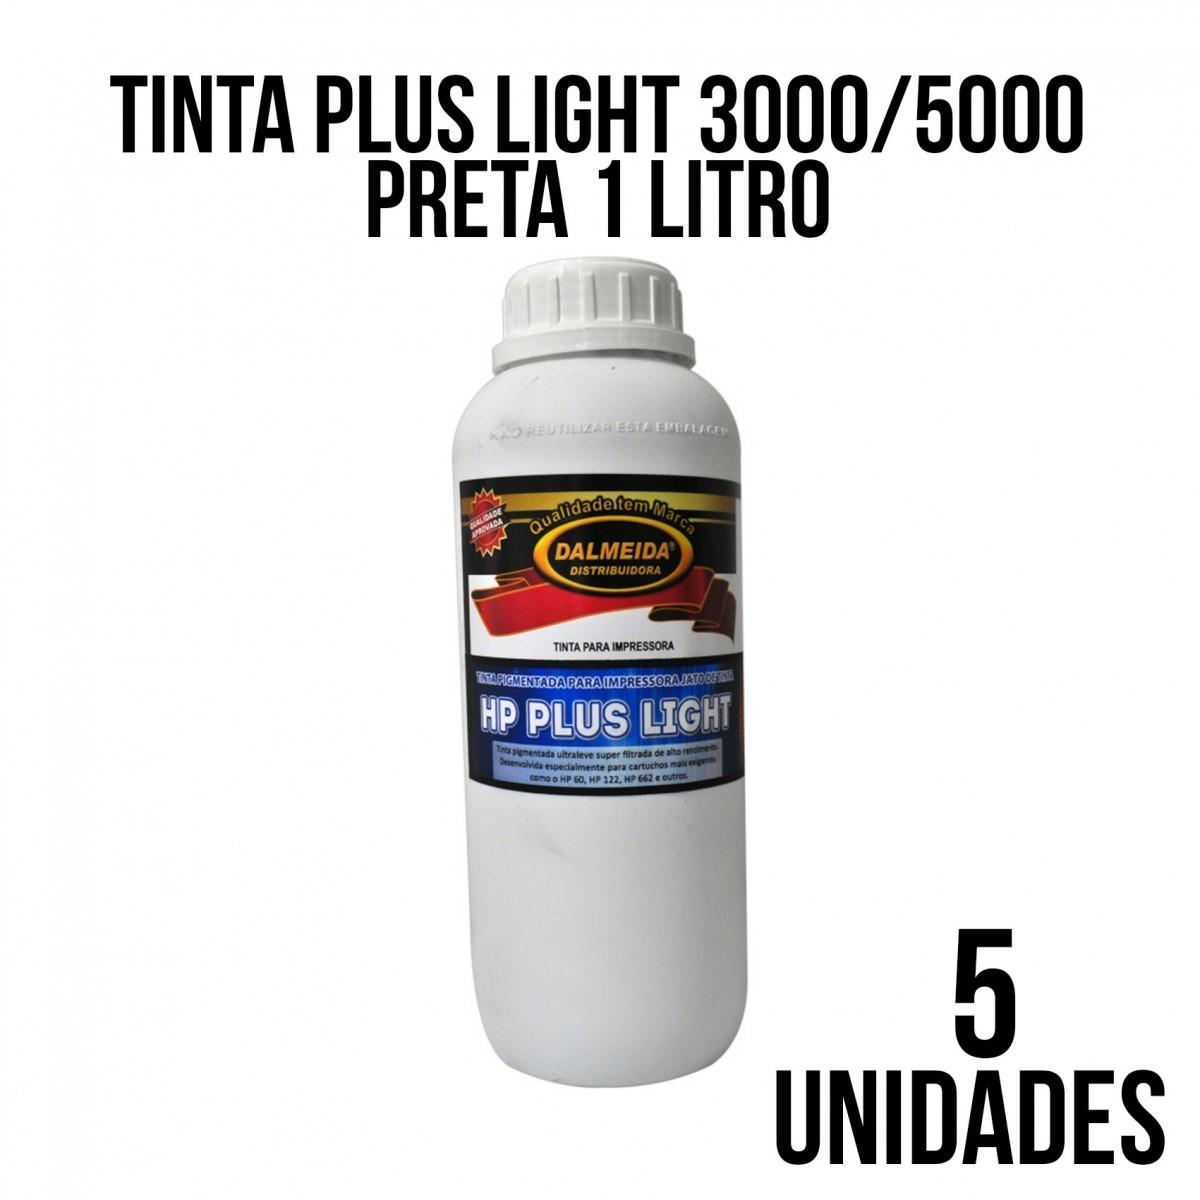 TINTA PLUS LIGHT 3000/5000 PRETA - COMBO COM 5 UNIDADES